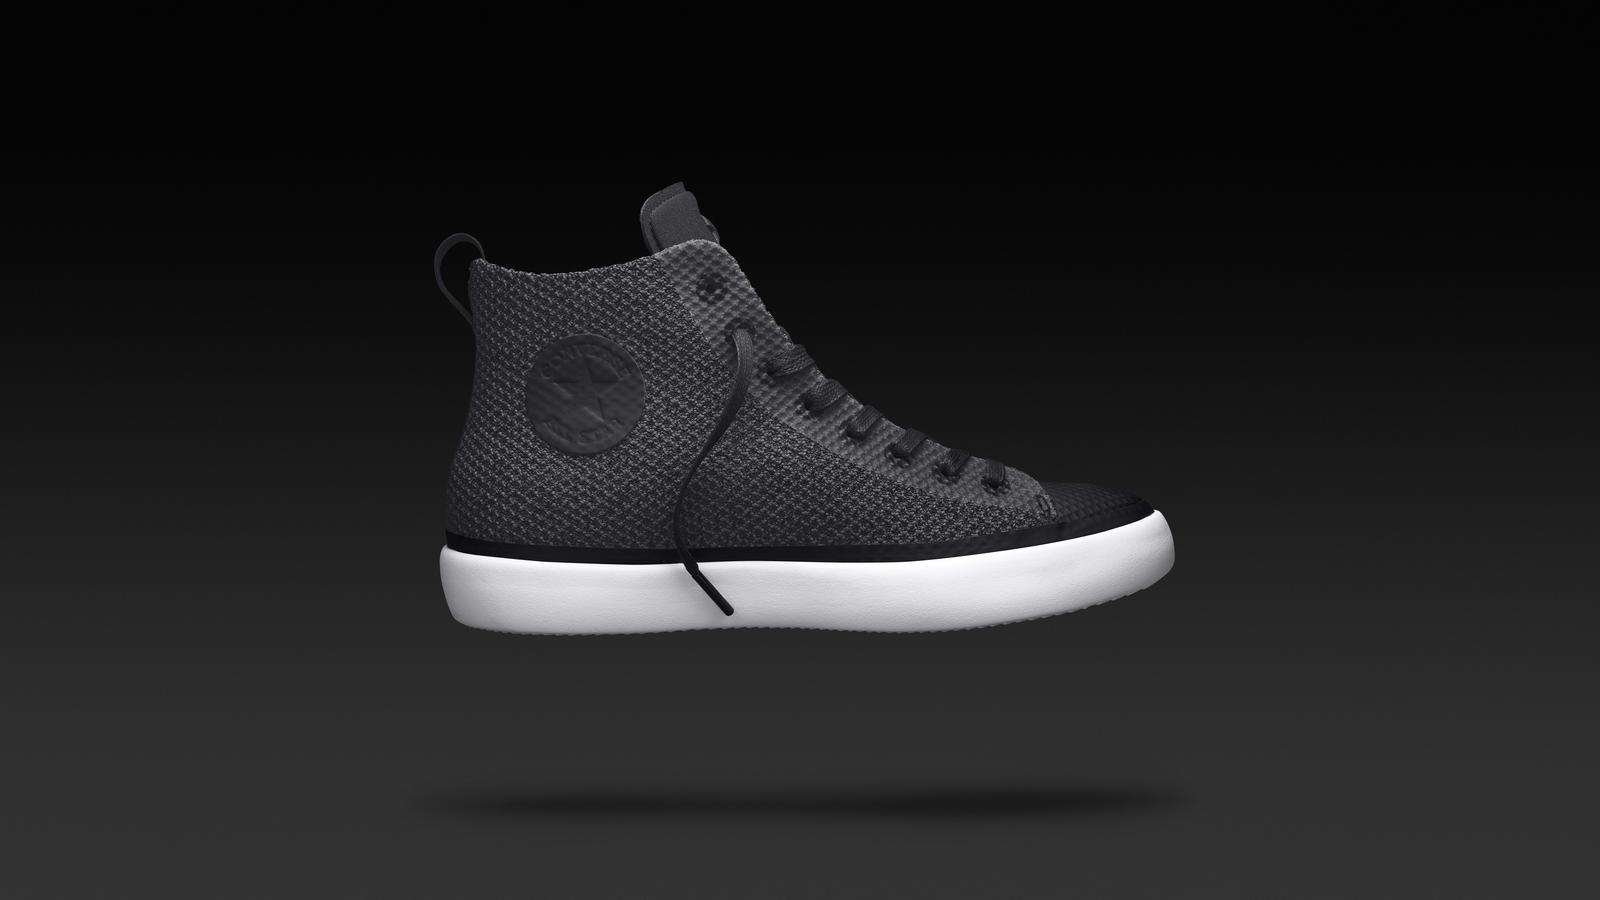 Converse Shoes Hd Pics